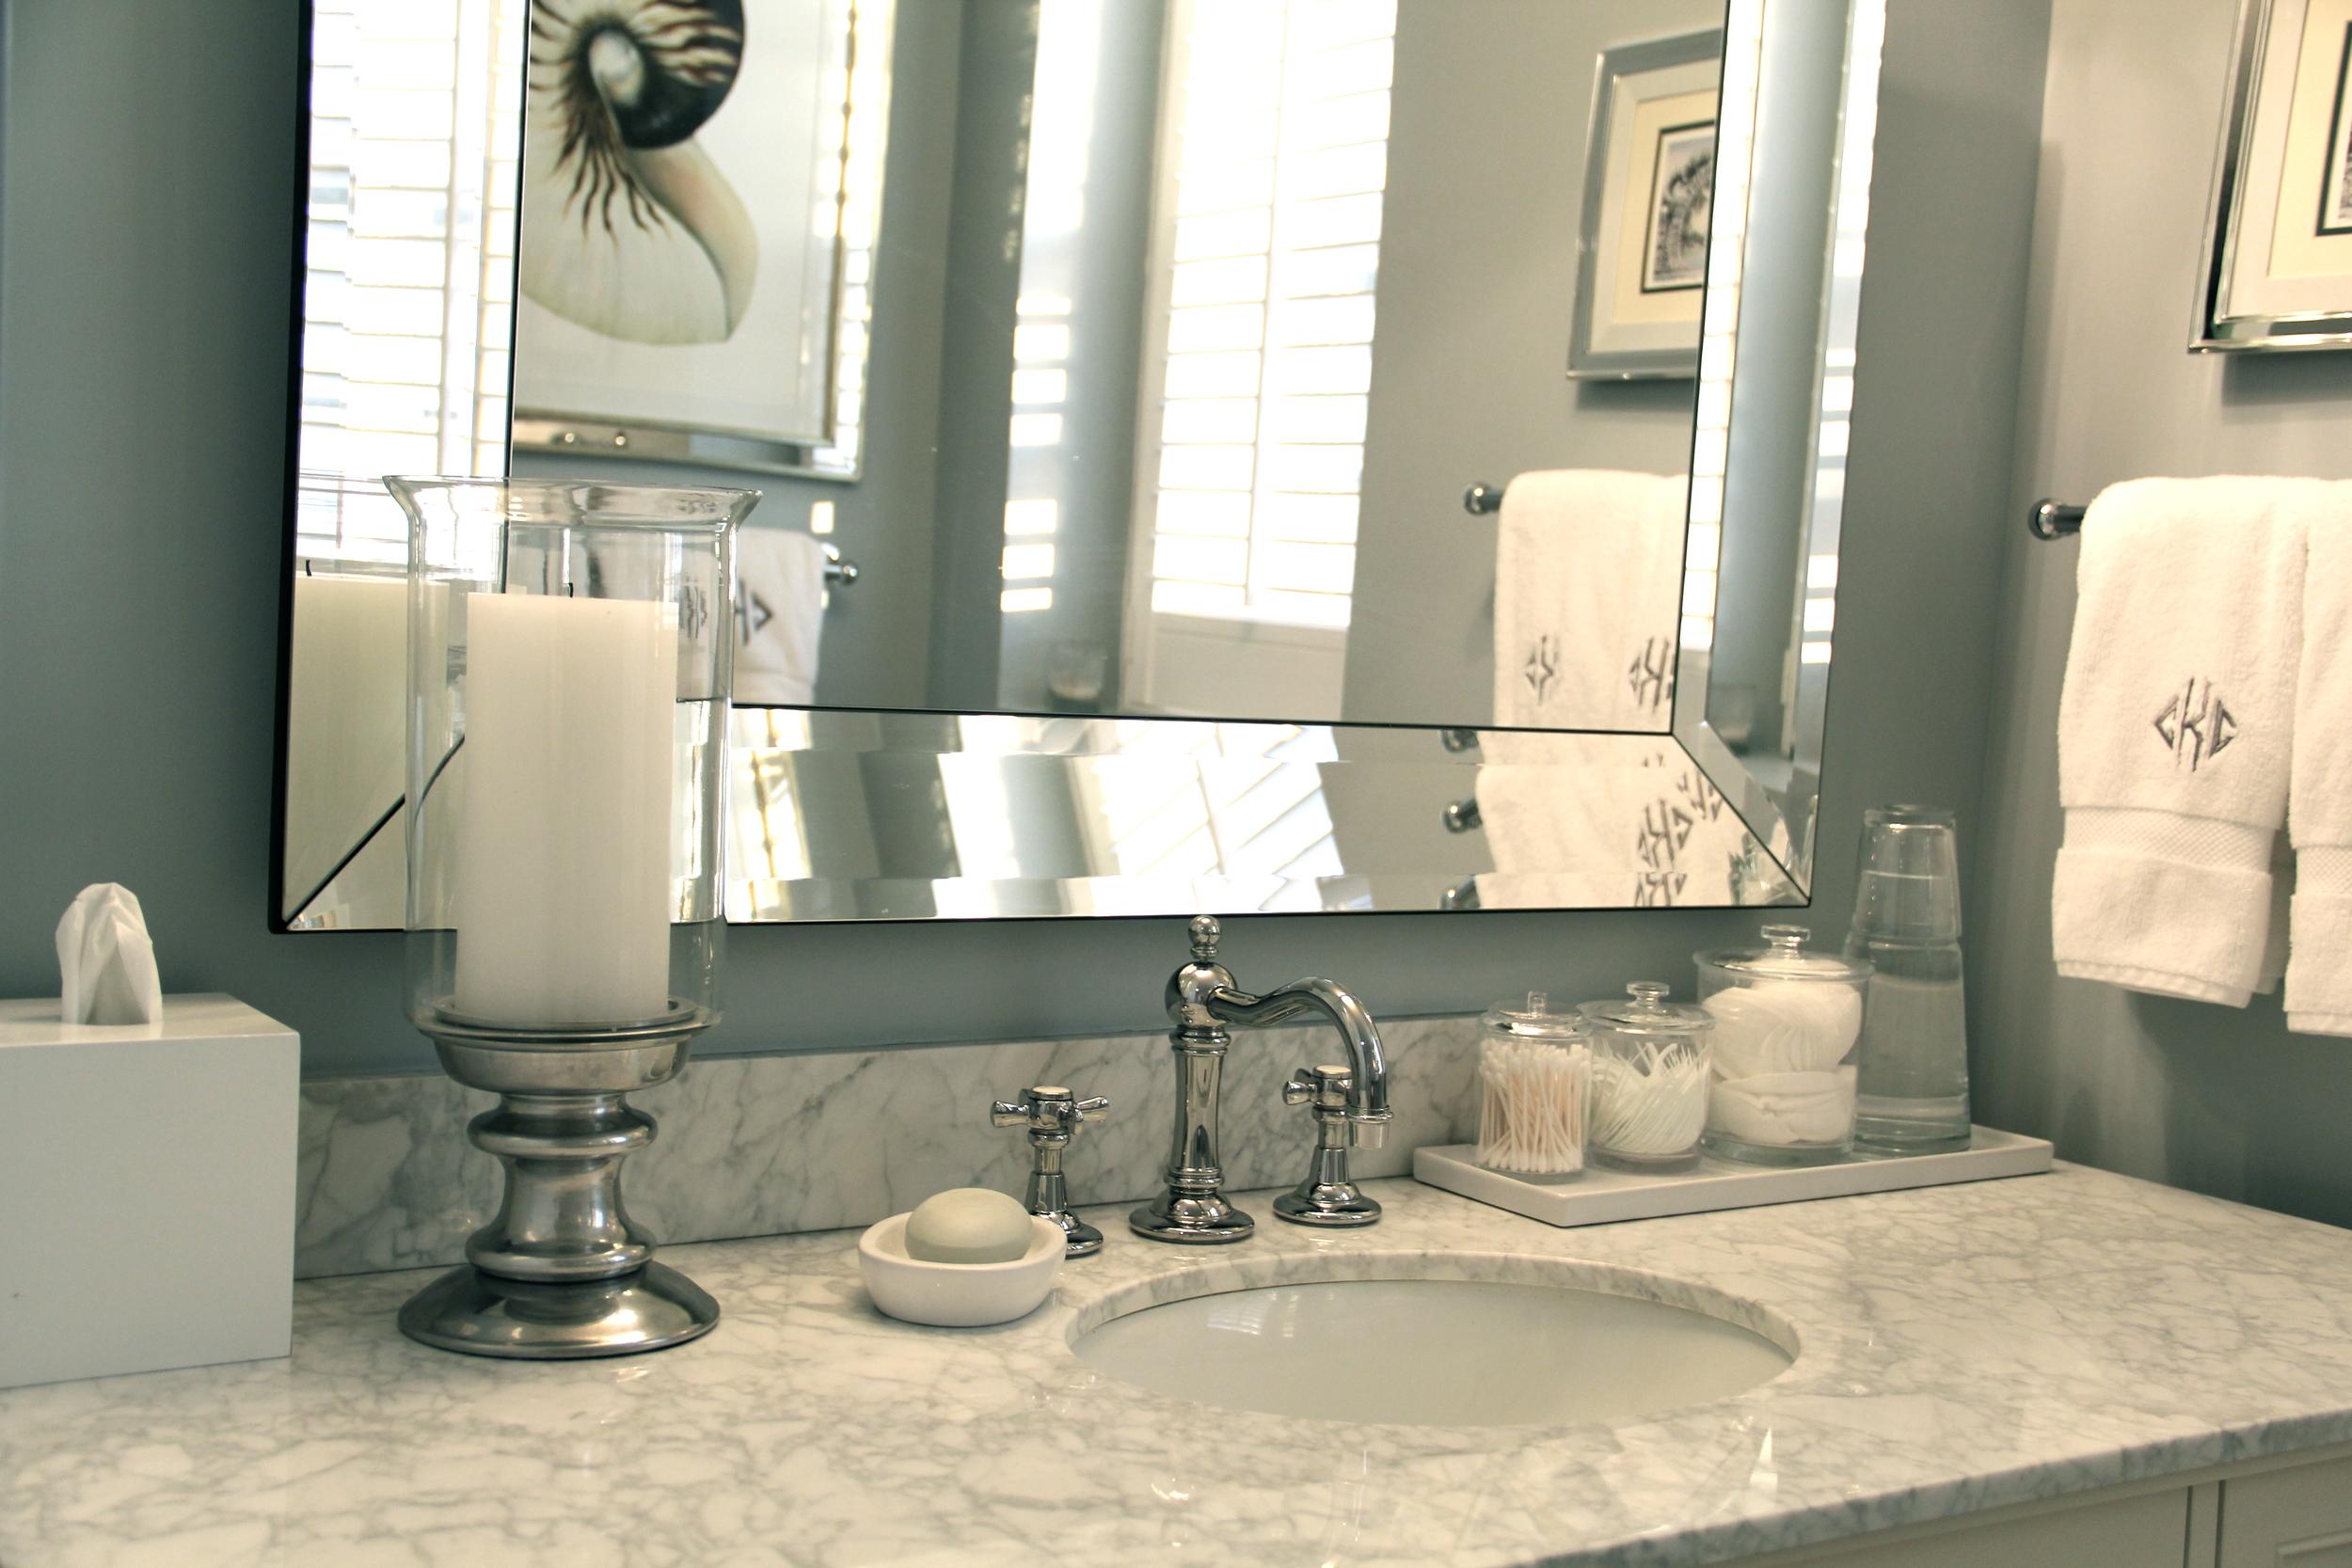 Bathroom Countertop Decor — Redefining Domestics on Countertop Decor  id=50793